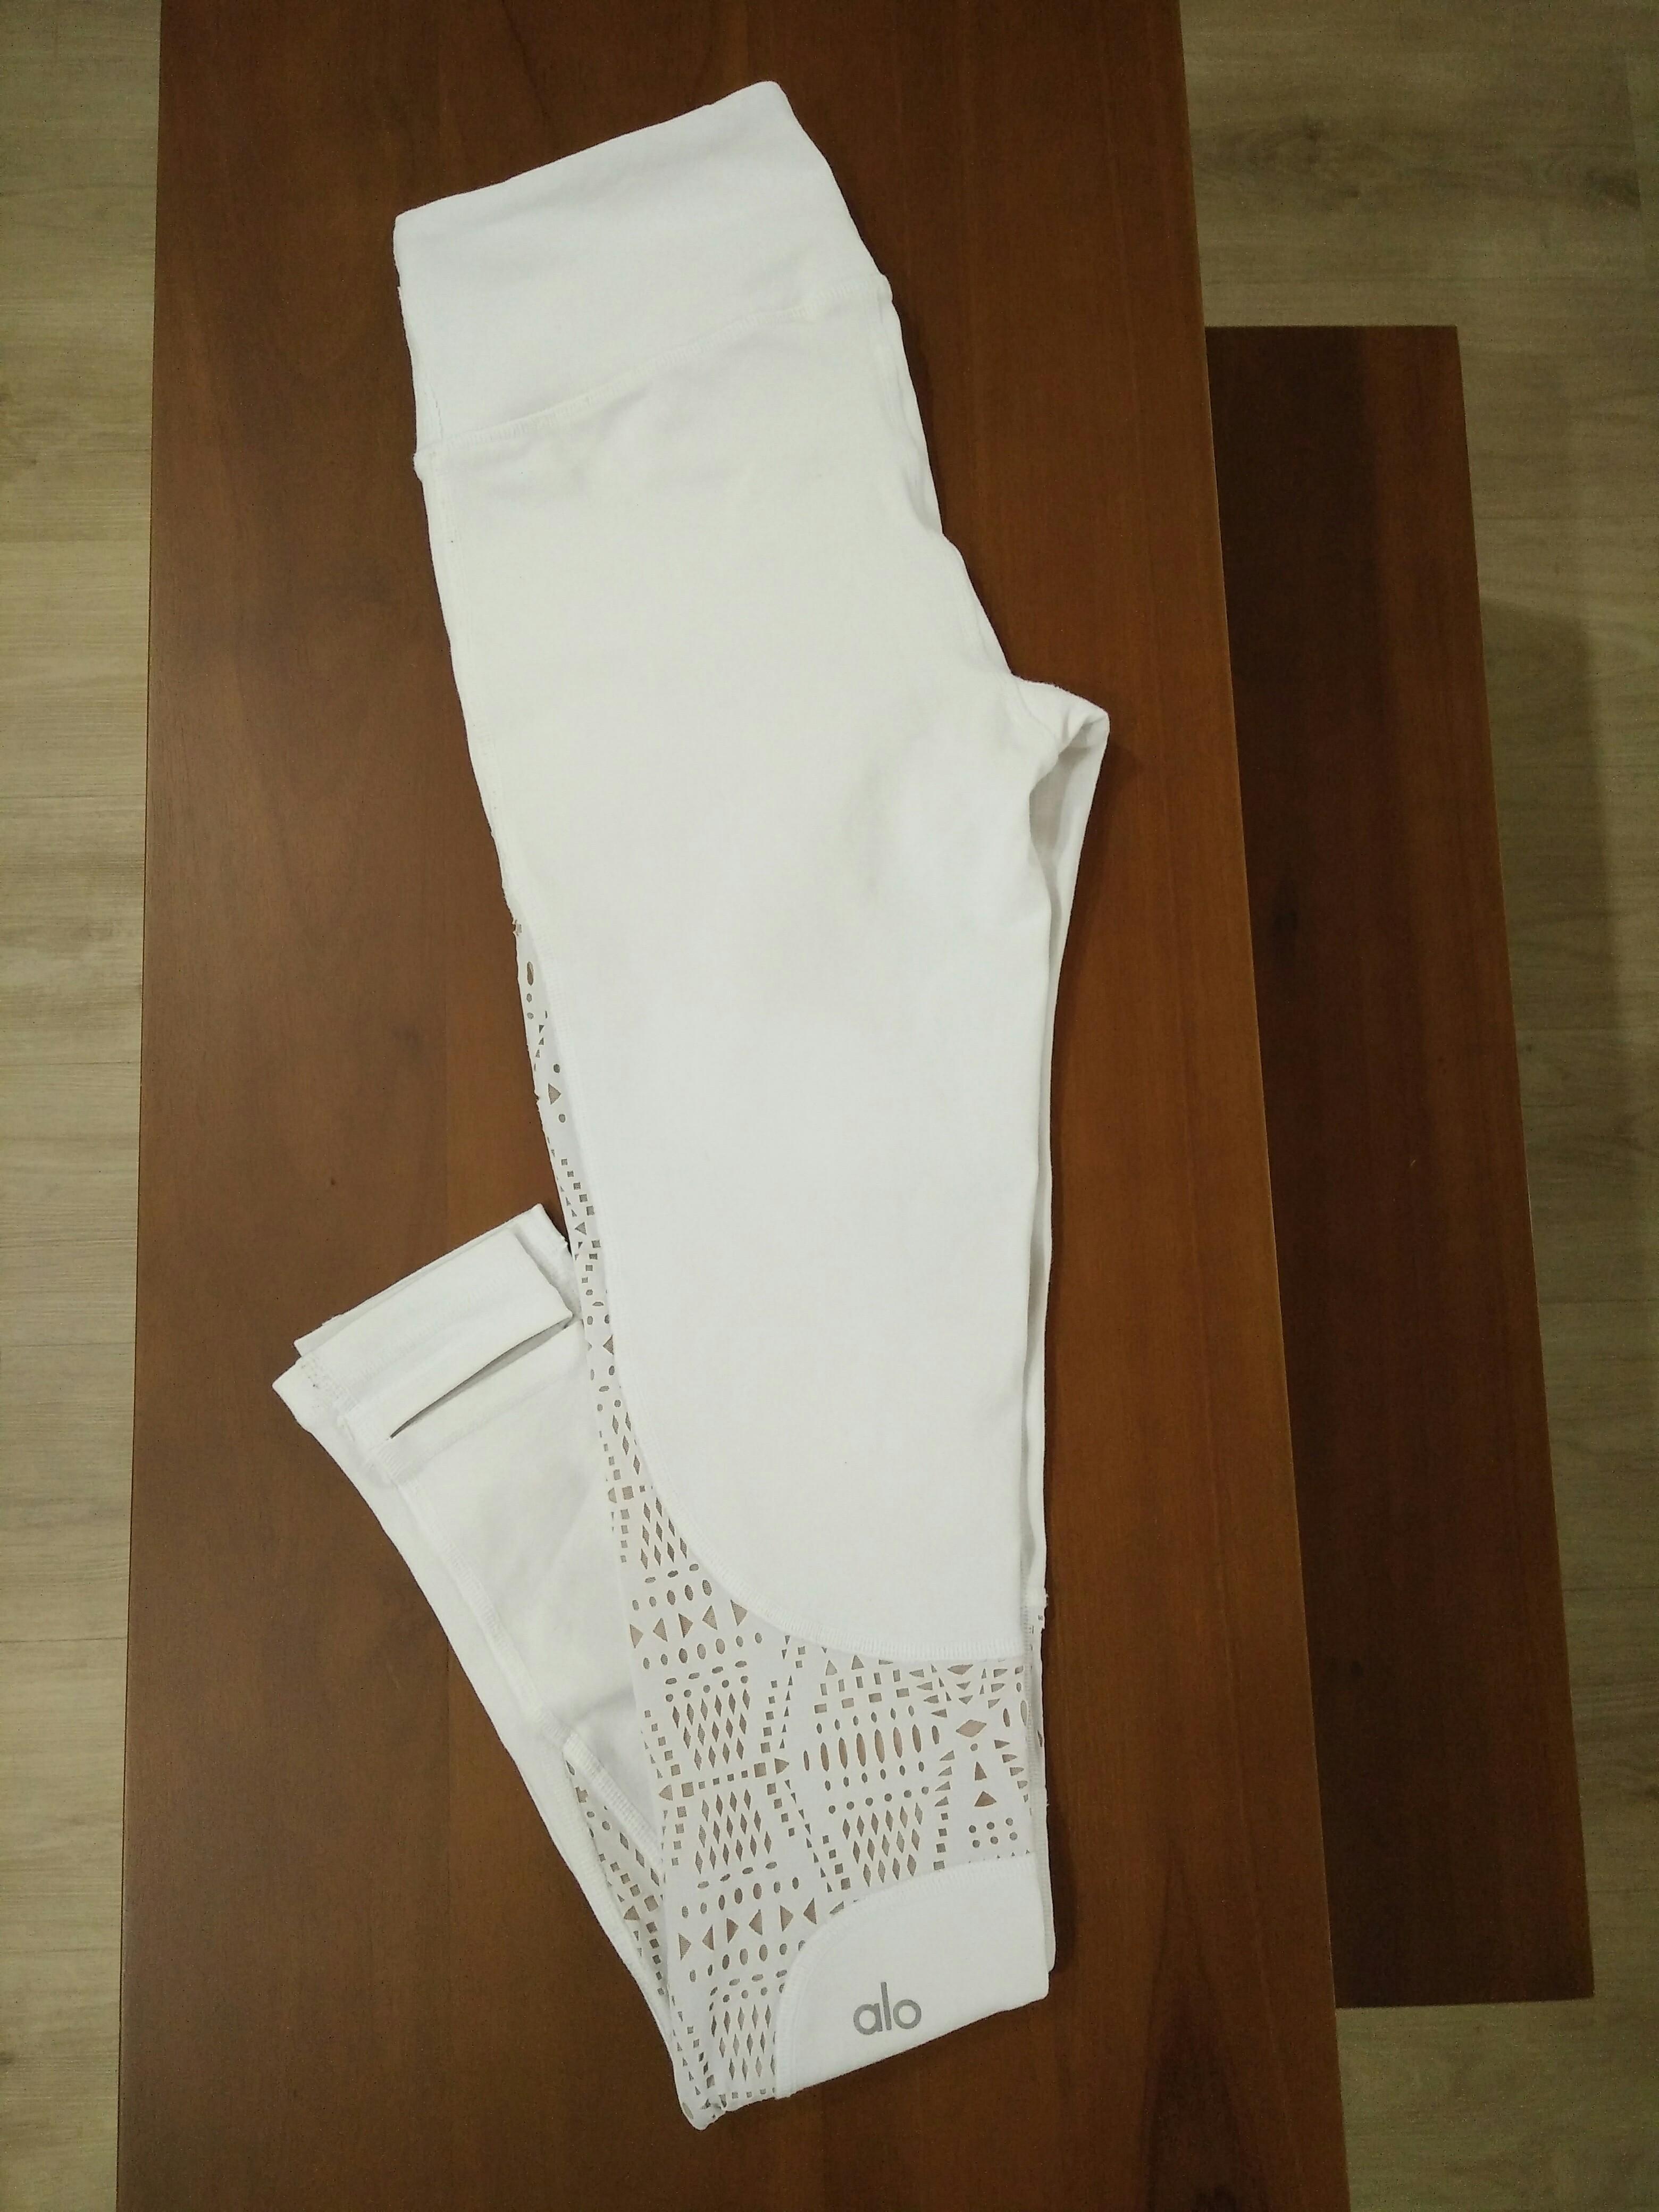 c9a16c778a510 Alo Yoga West Coast Legging XS (White/buff), Sports, Sports Apparel ...